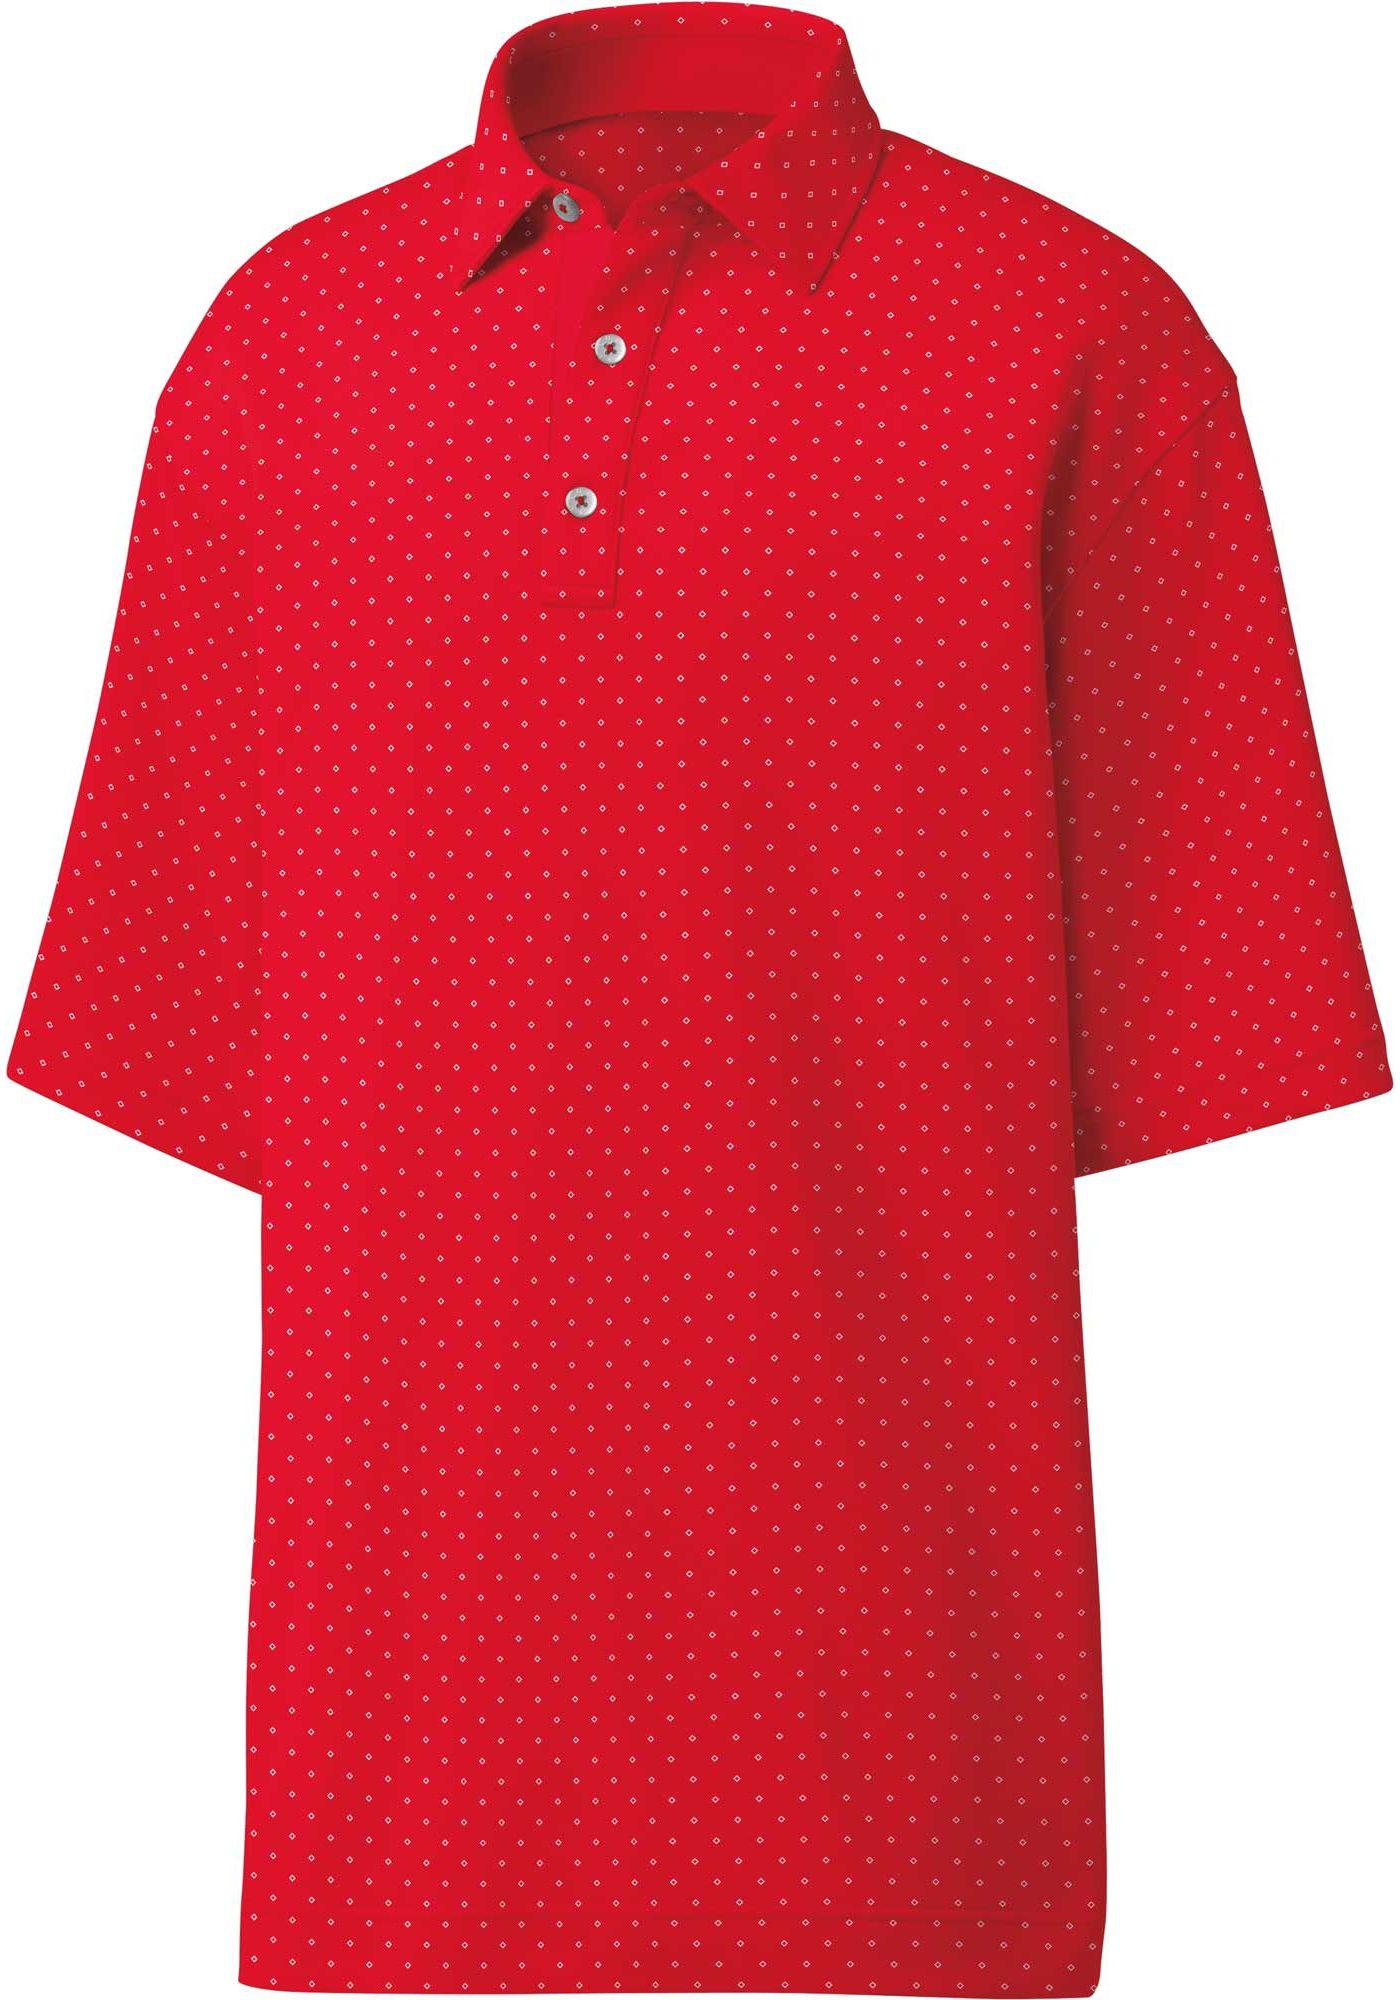 FootJoy Men's Diamond Print Golf Polo